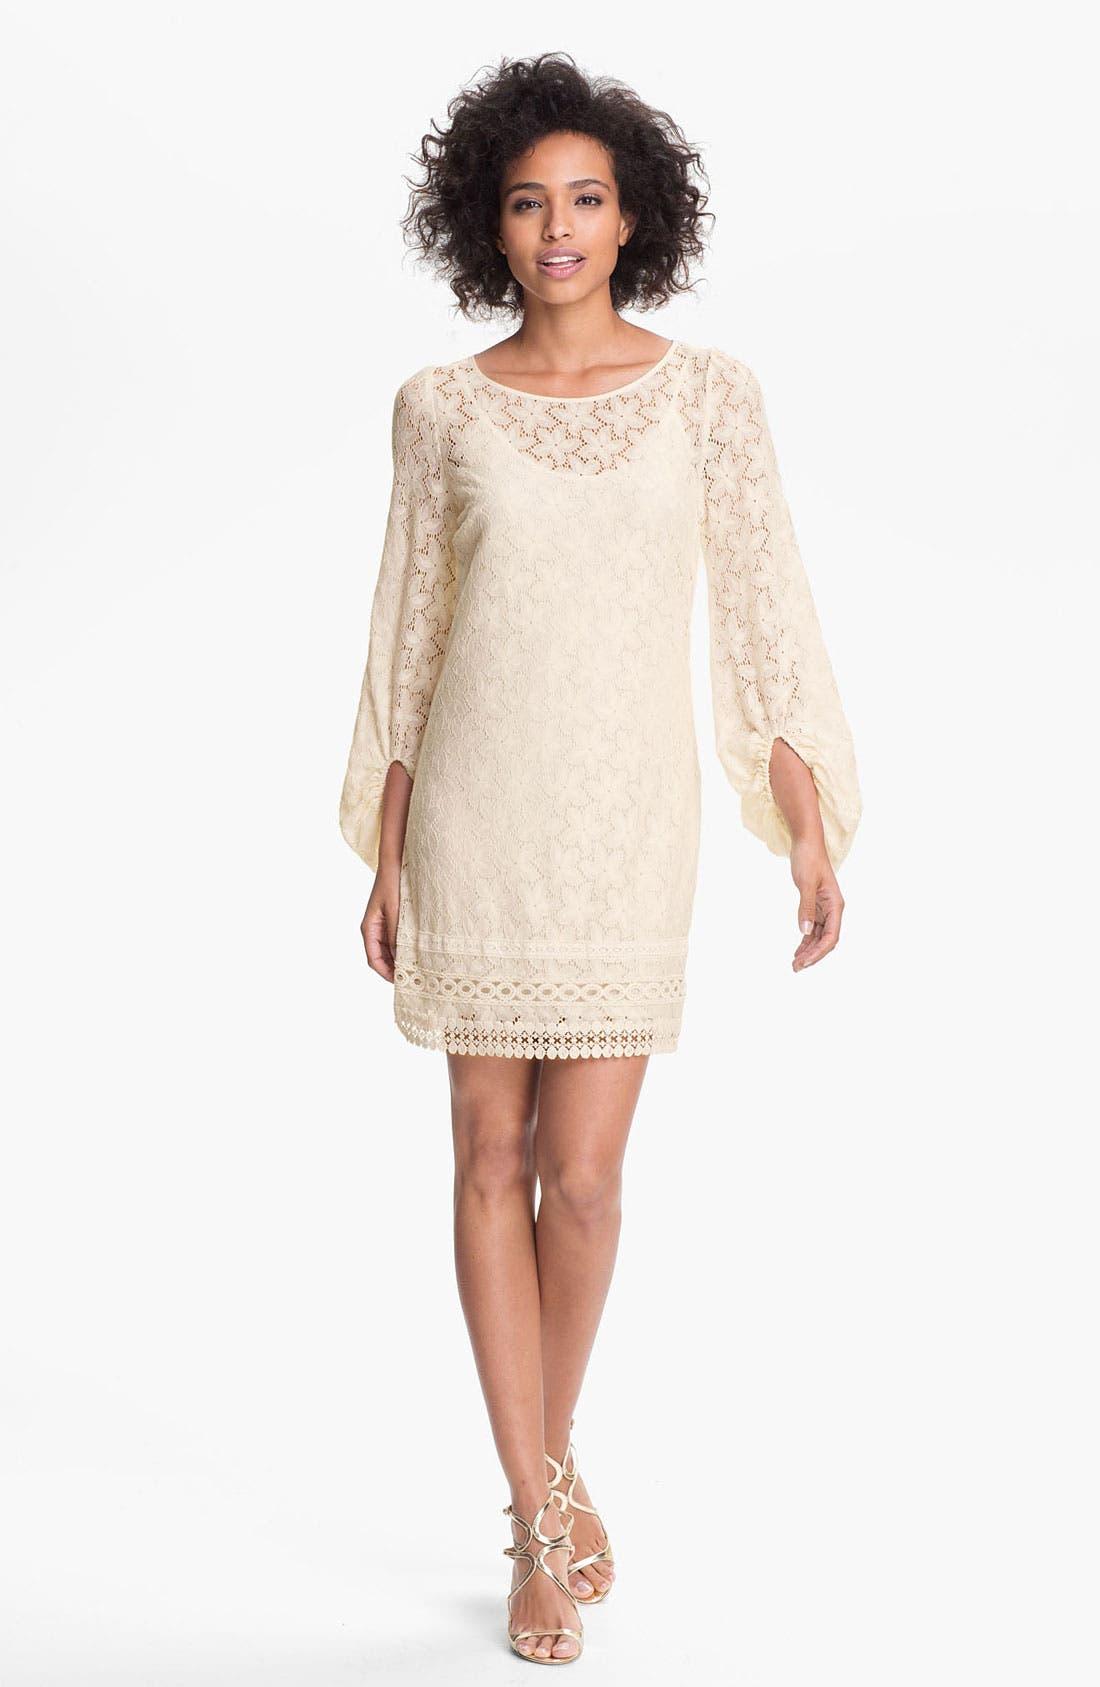 Main Image - Laundry by Shelli Segal 'Sand Dollar' Lace Shift Dress (Petite)